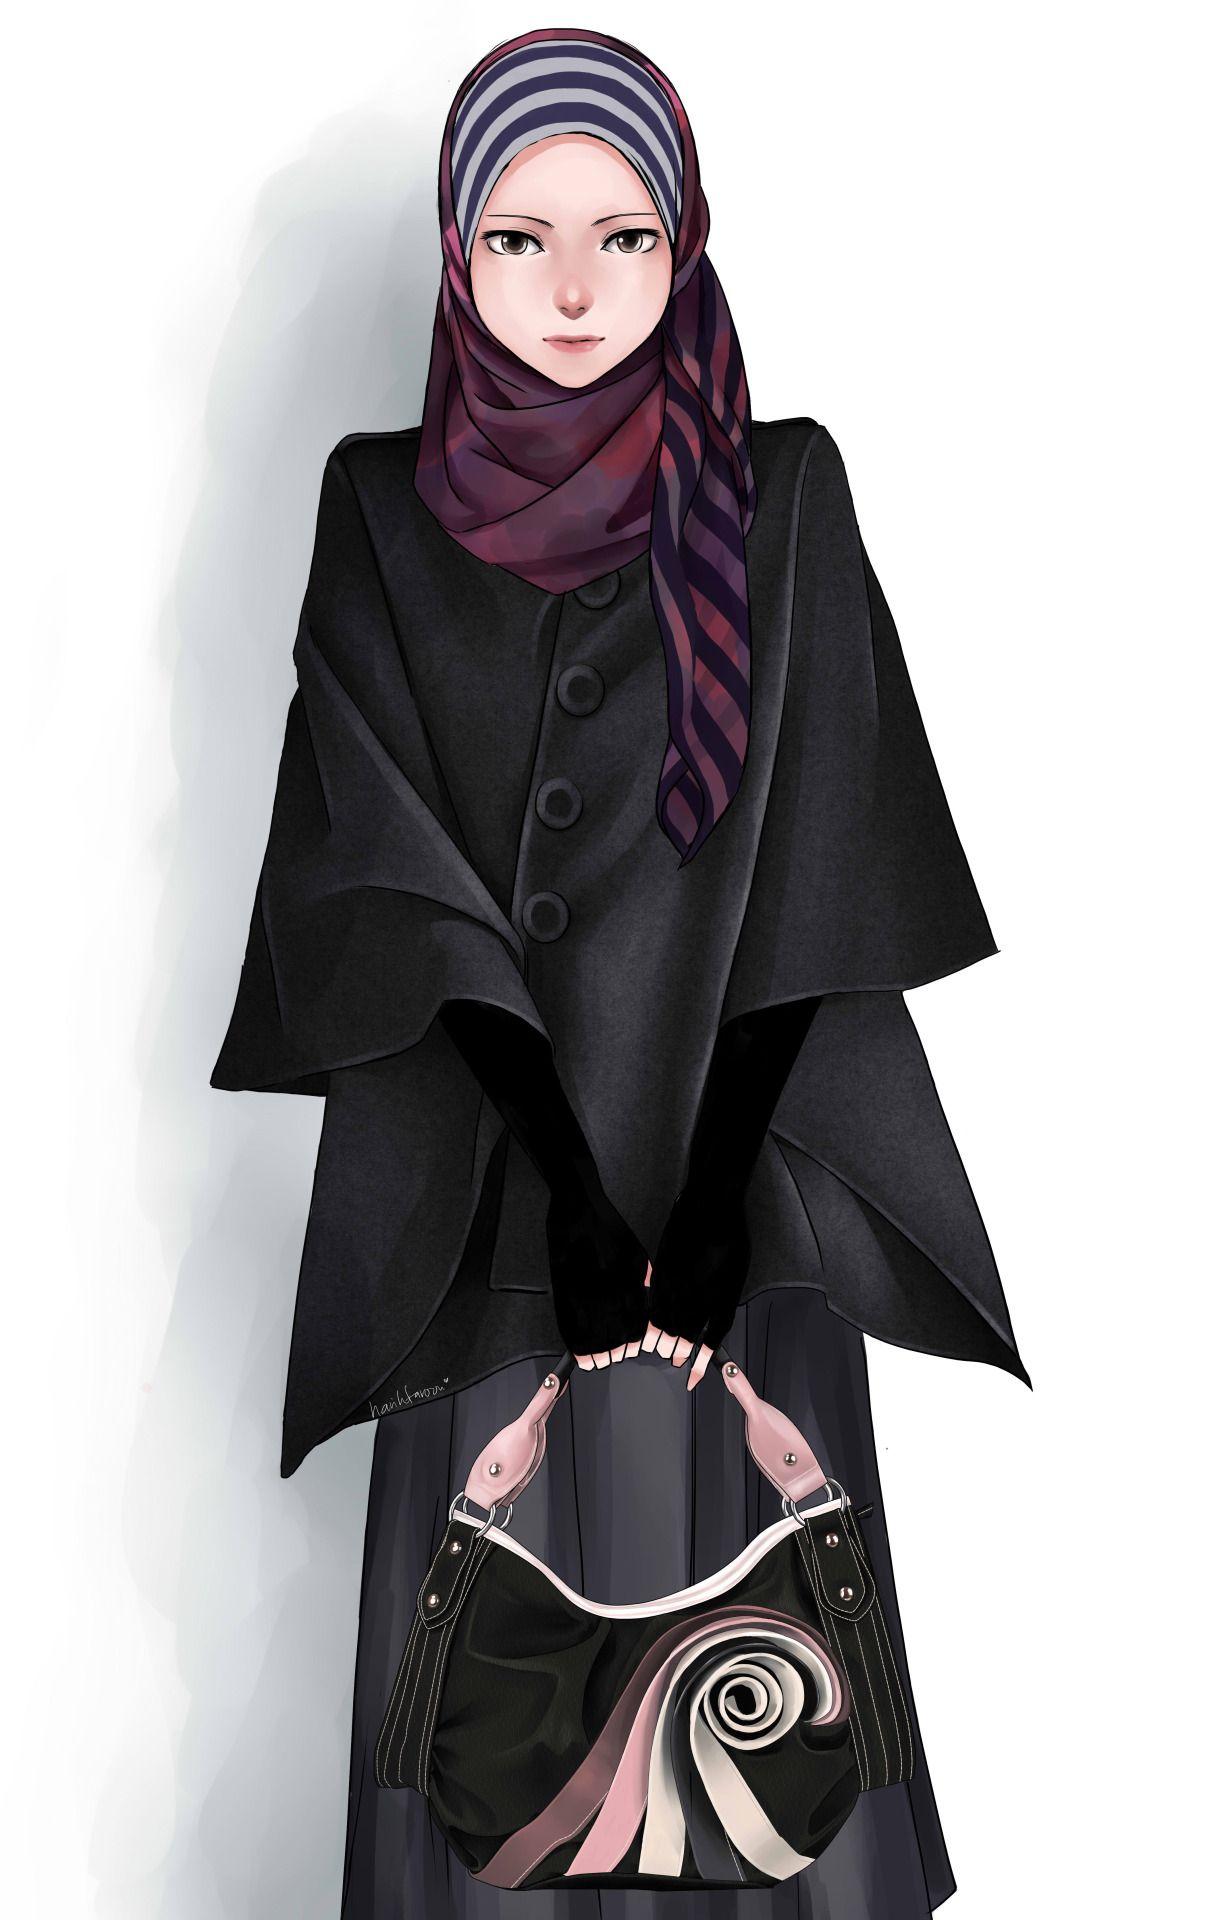 Hijab Styleu2026.Tool Paint Tool Saiu2026.   FASHION ILLUSTRATION   Pinterest   Illustrations Fashion ...